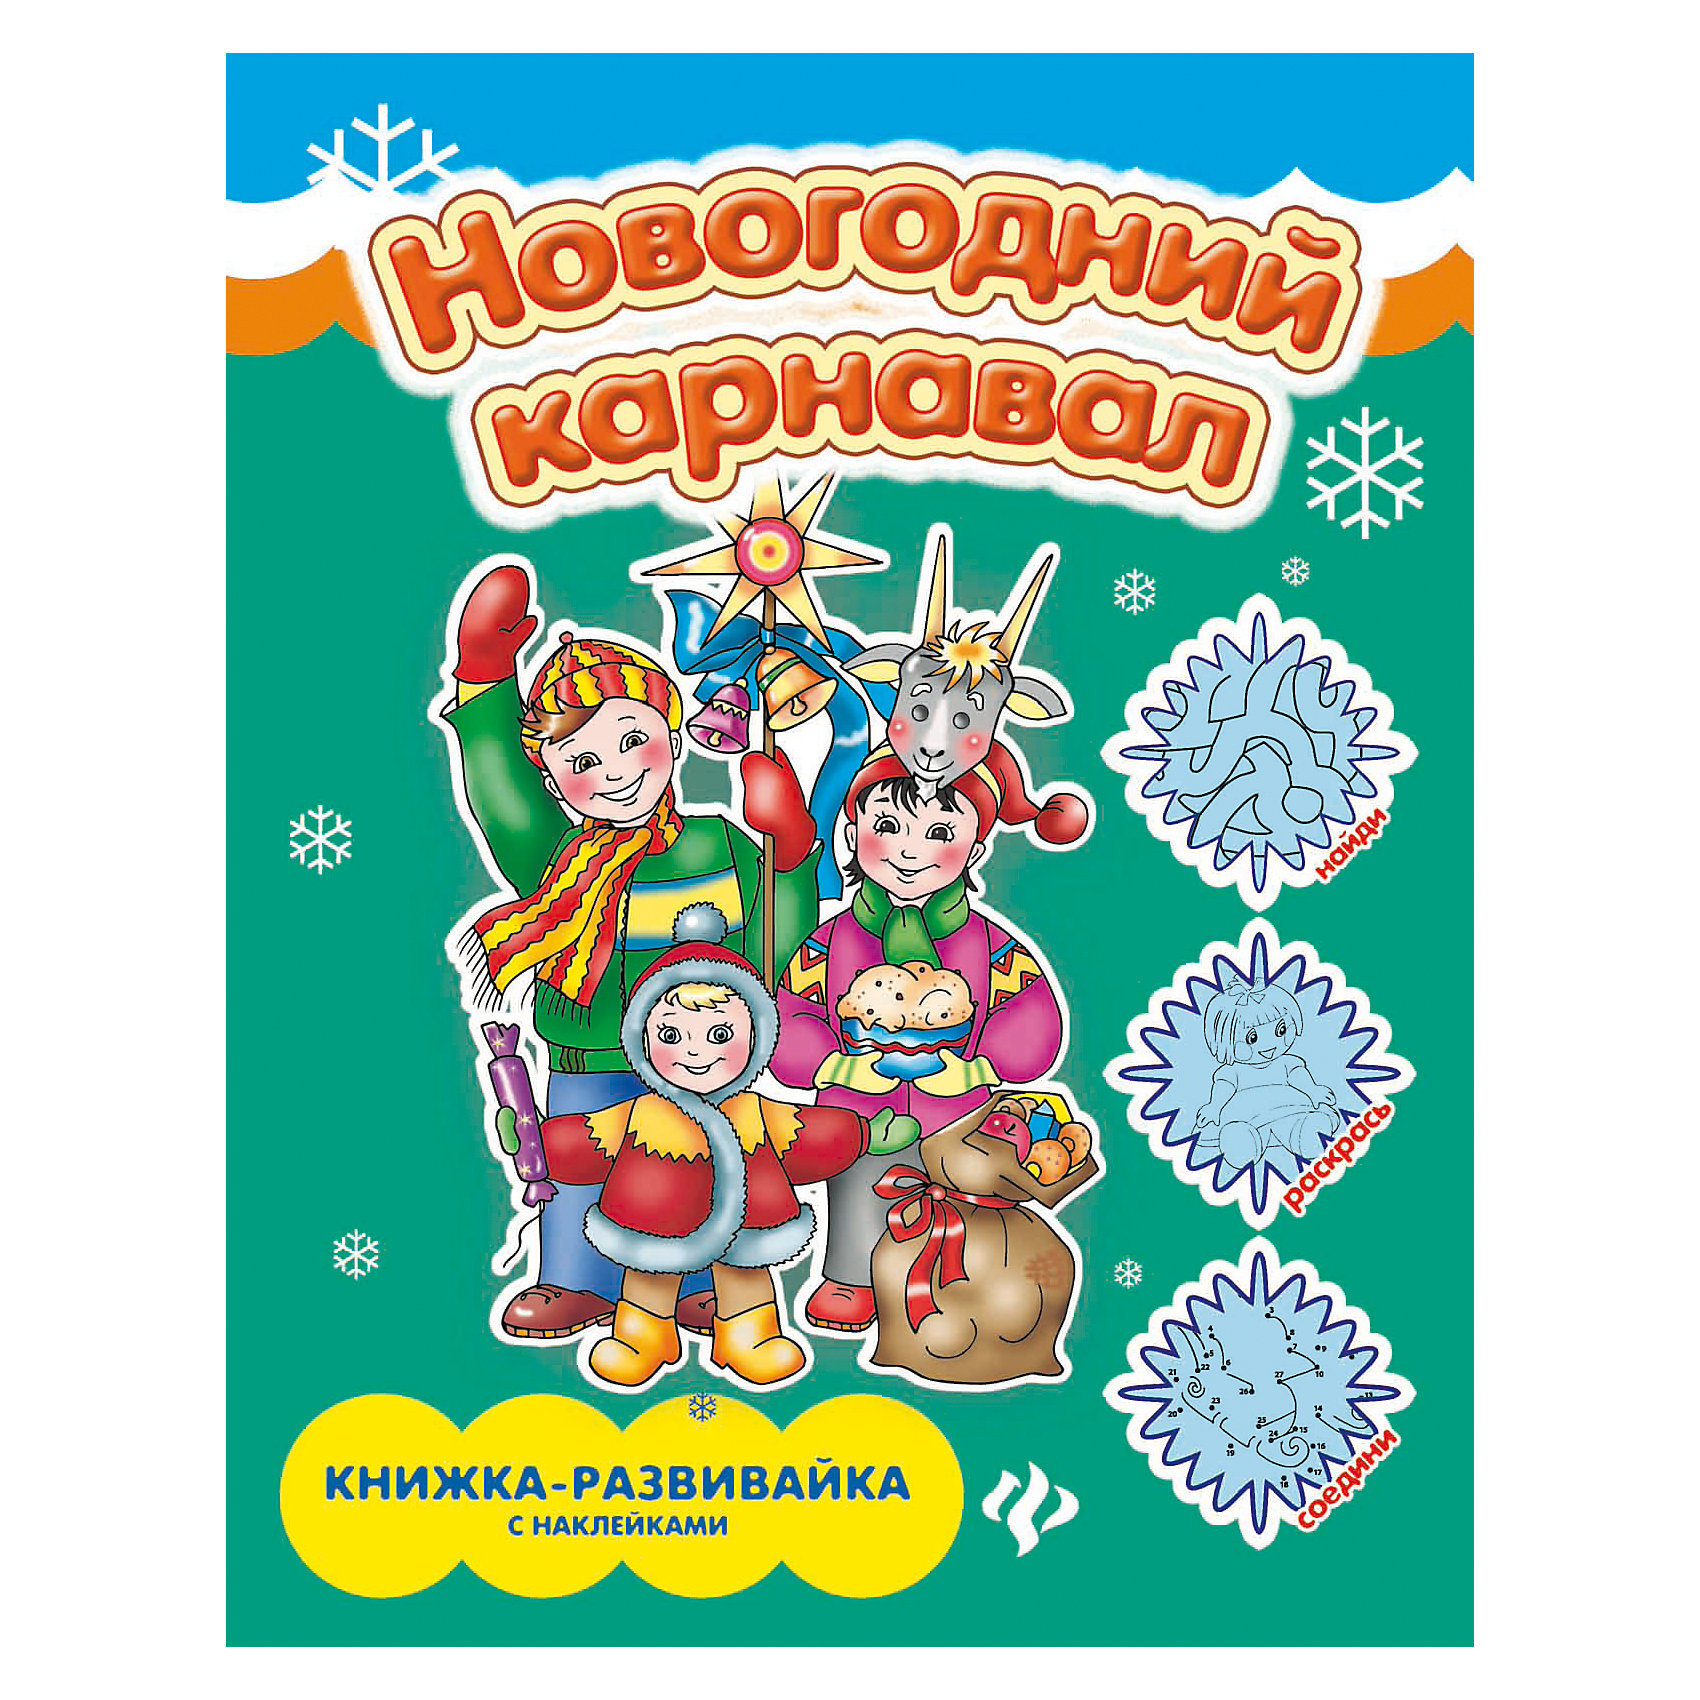 Новогодний карнавал: книжка-плакат